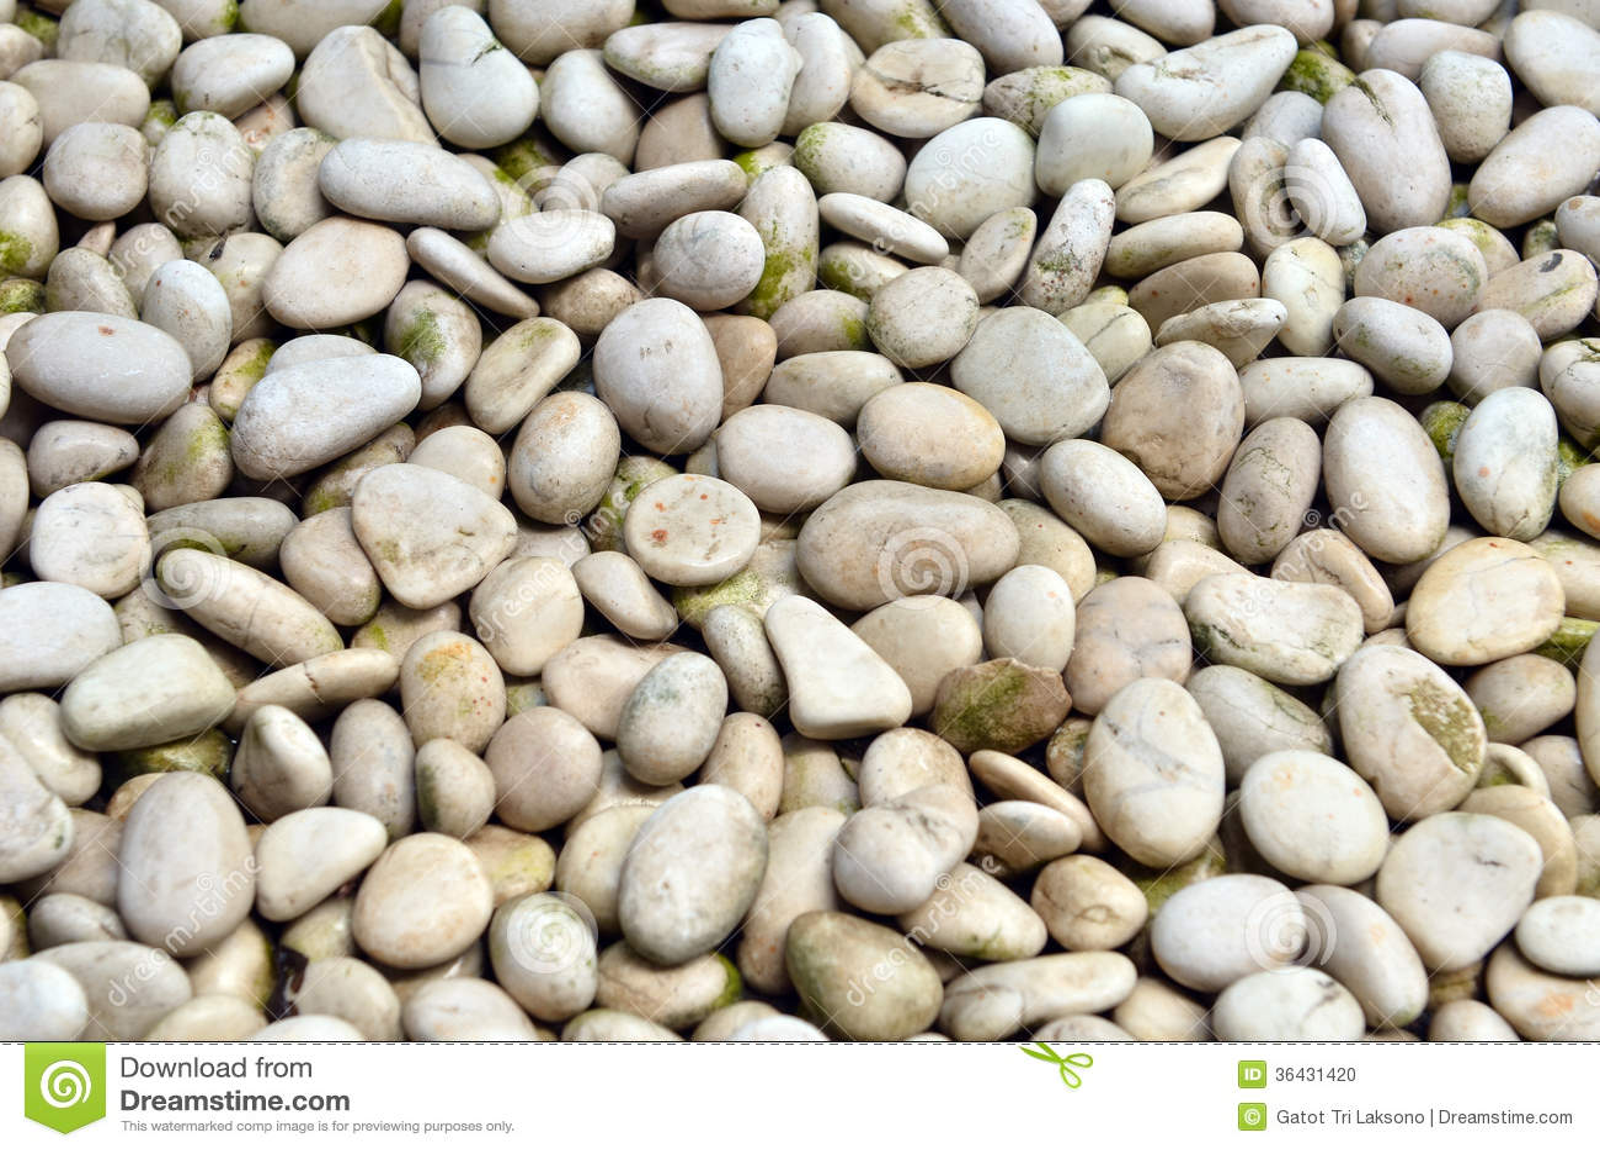 pedras de jardim branca : pedras de jardim branca:As pedras naturais brancas podem usar-se para a textura de pedra. esta